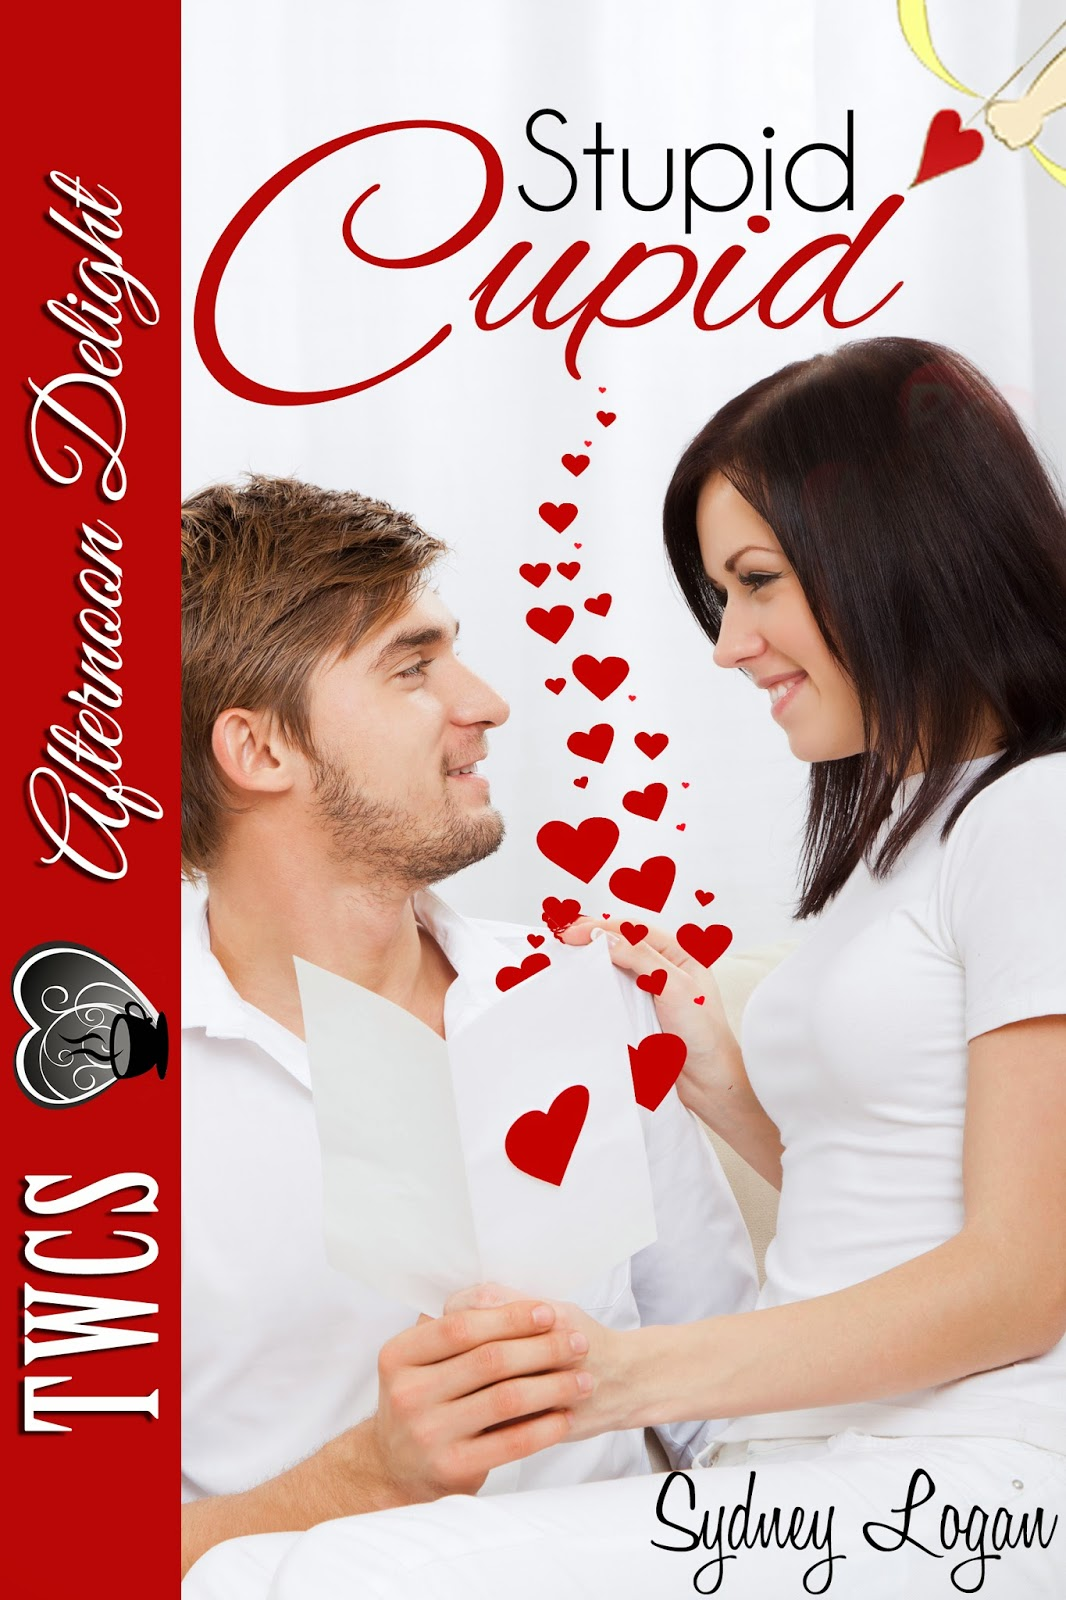 Cupid dating in Sydney